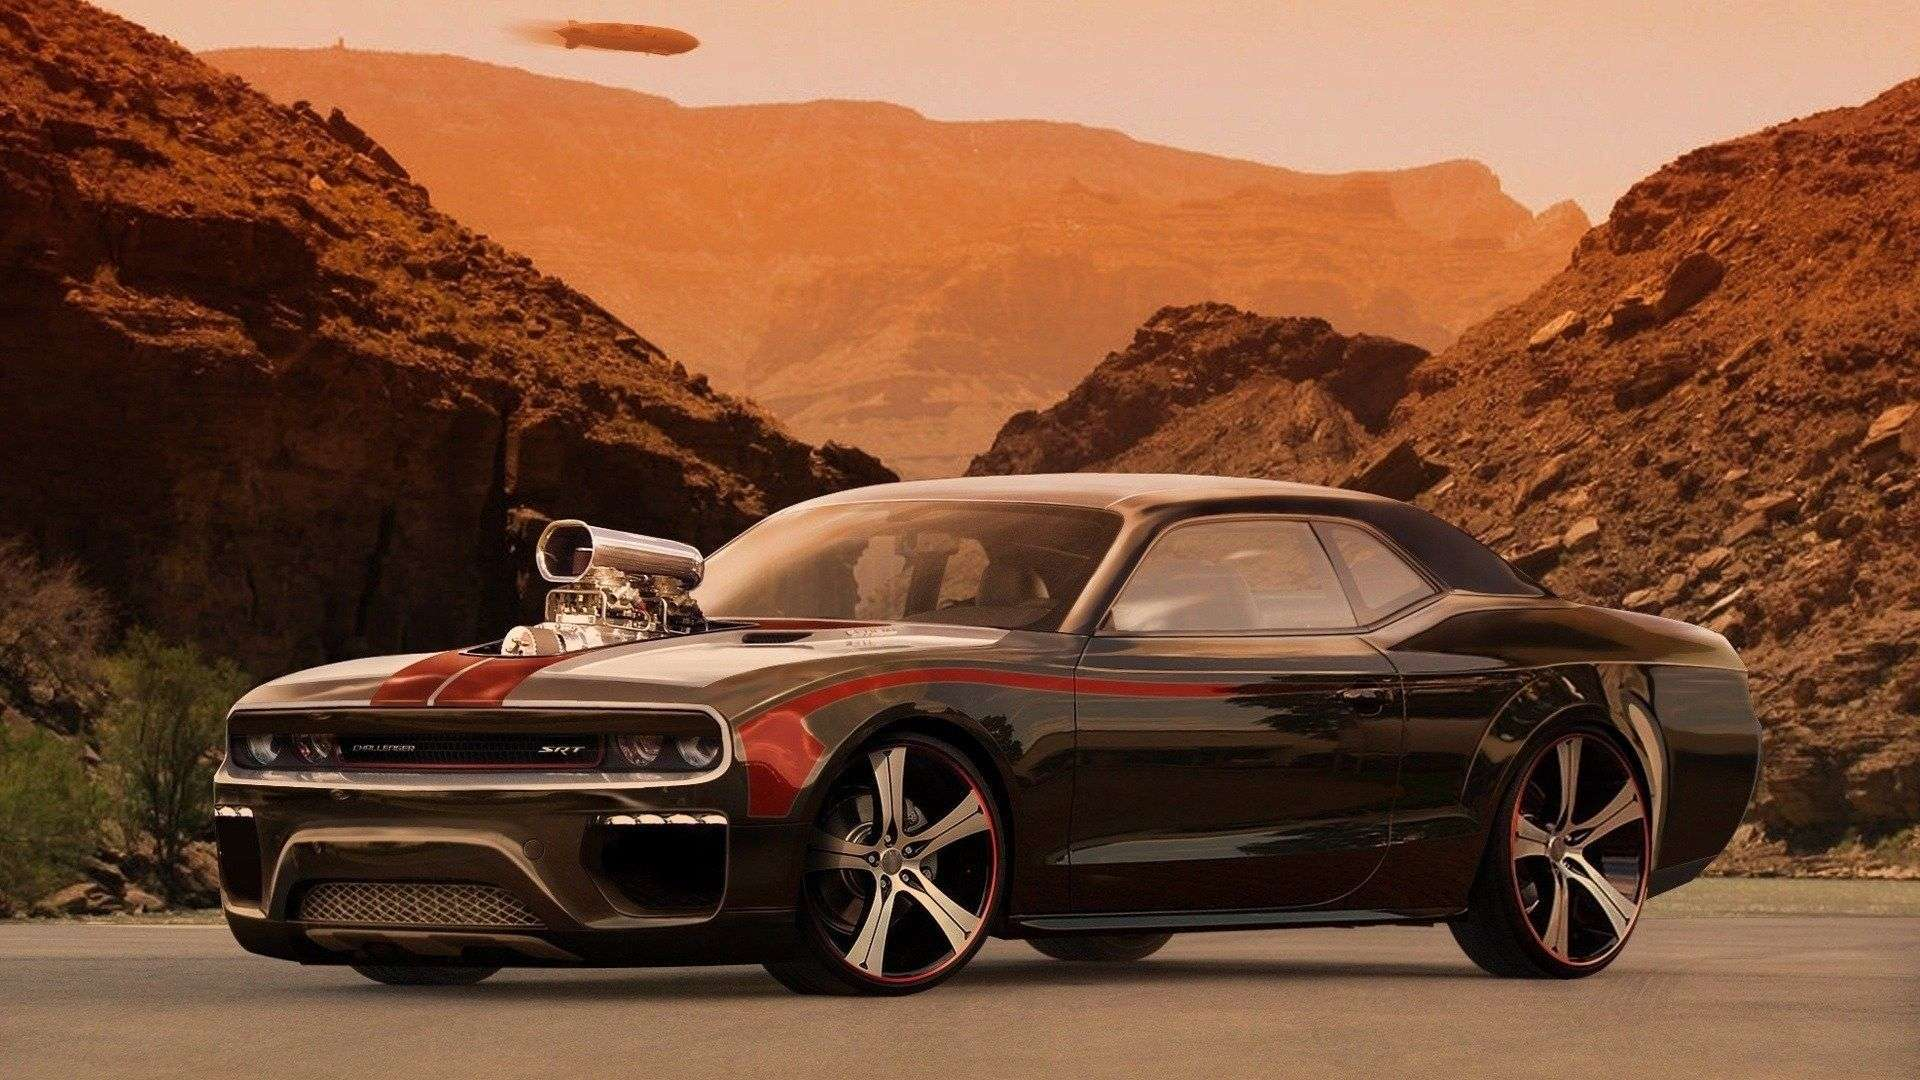 muscle cars wallpapers high resolution - wallpapersafari